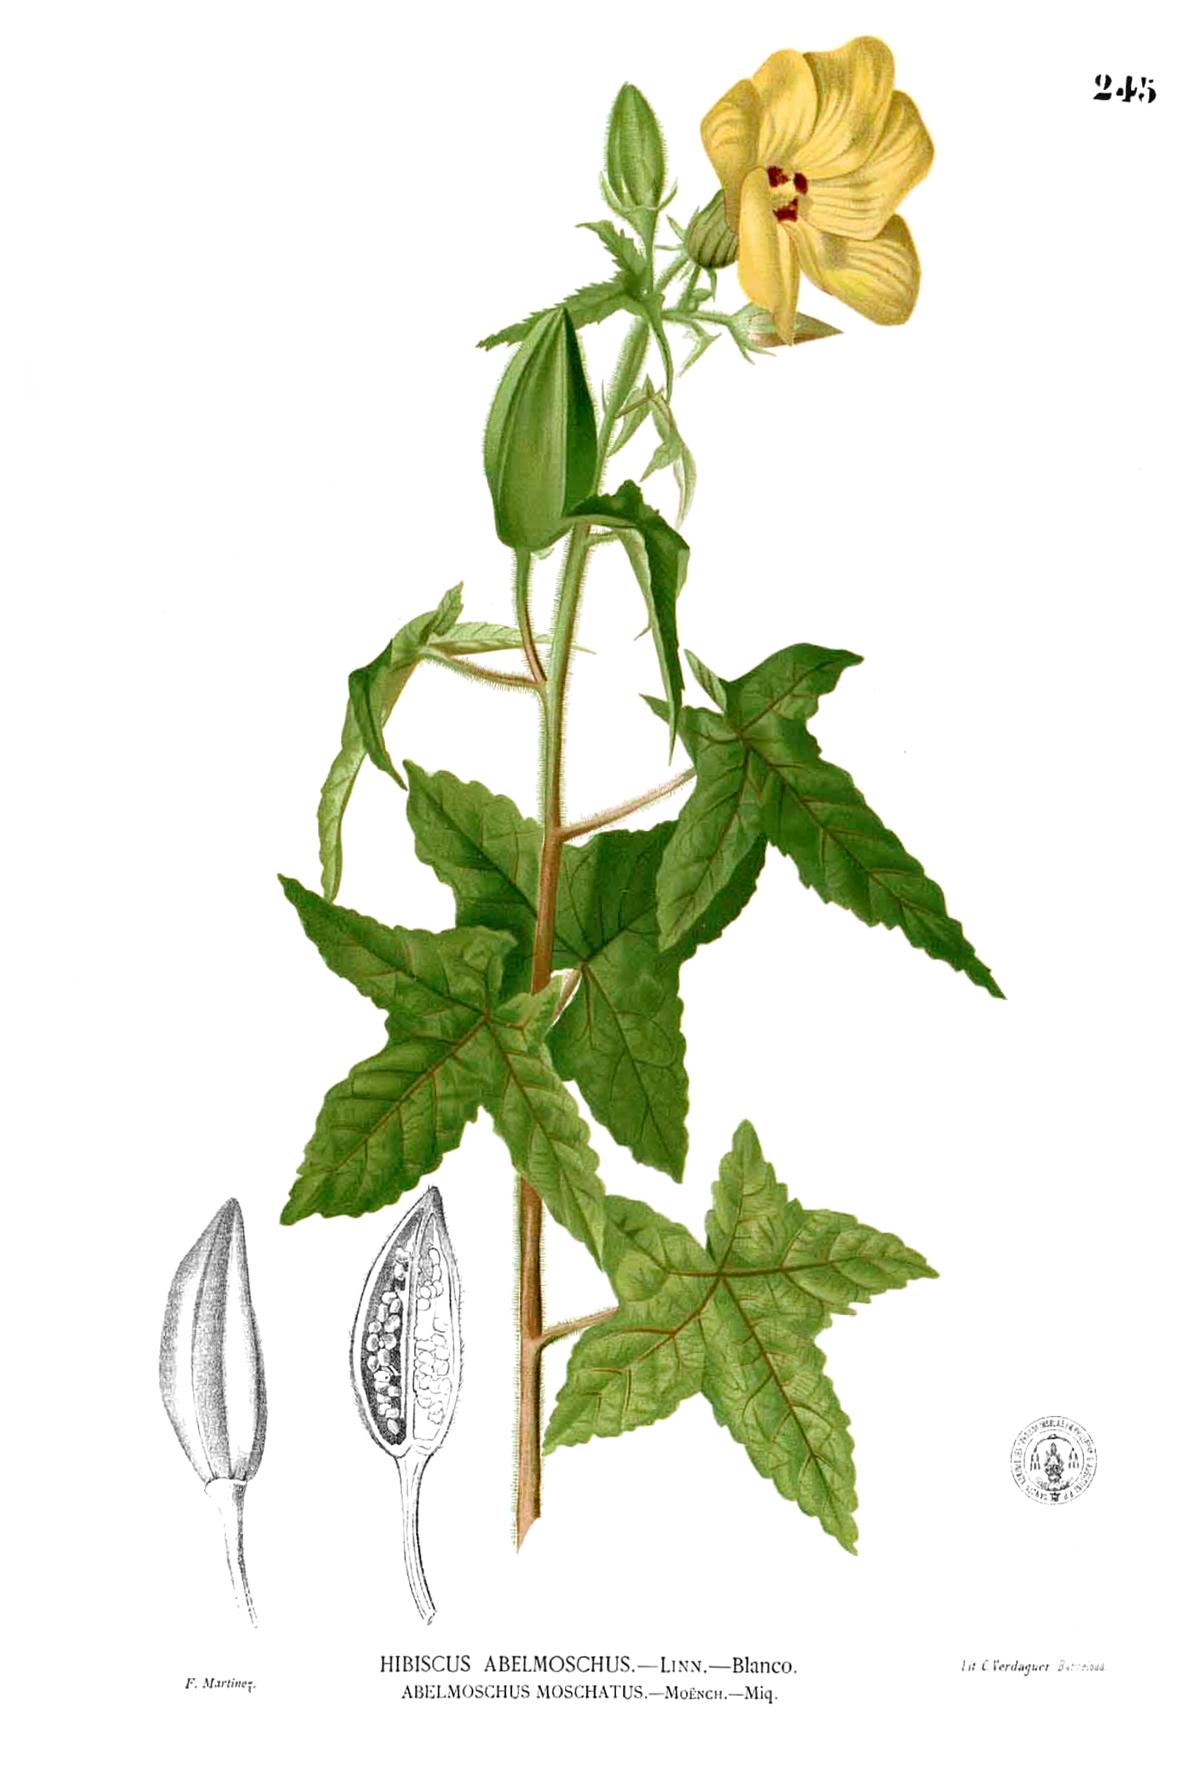 Abelmoschus moschatus - Wikipedia